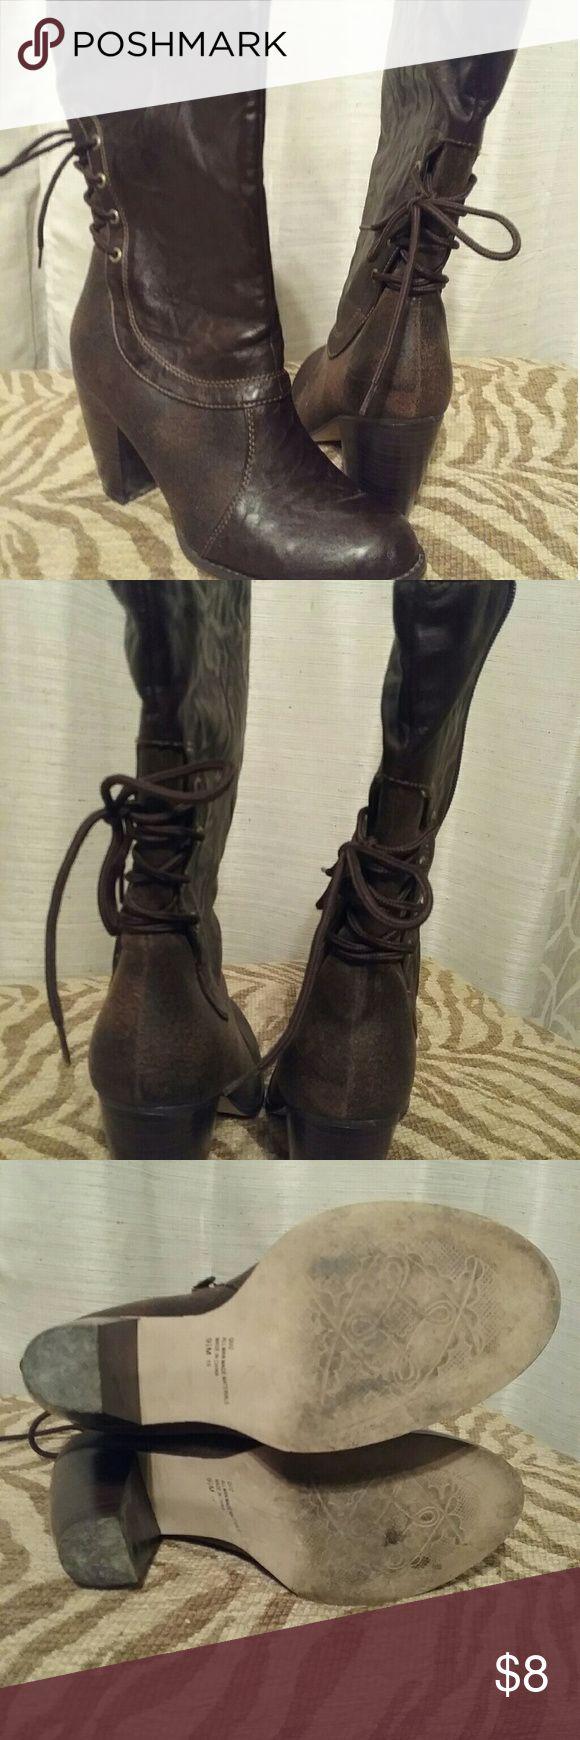 Womens mid calf boots Super cute mid calf boots. Good condition Vigoss Shoes Heeled Boots